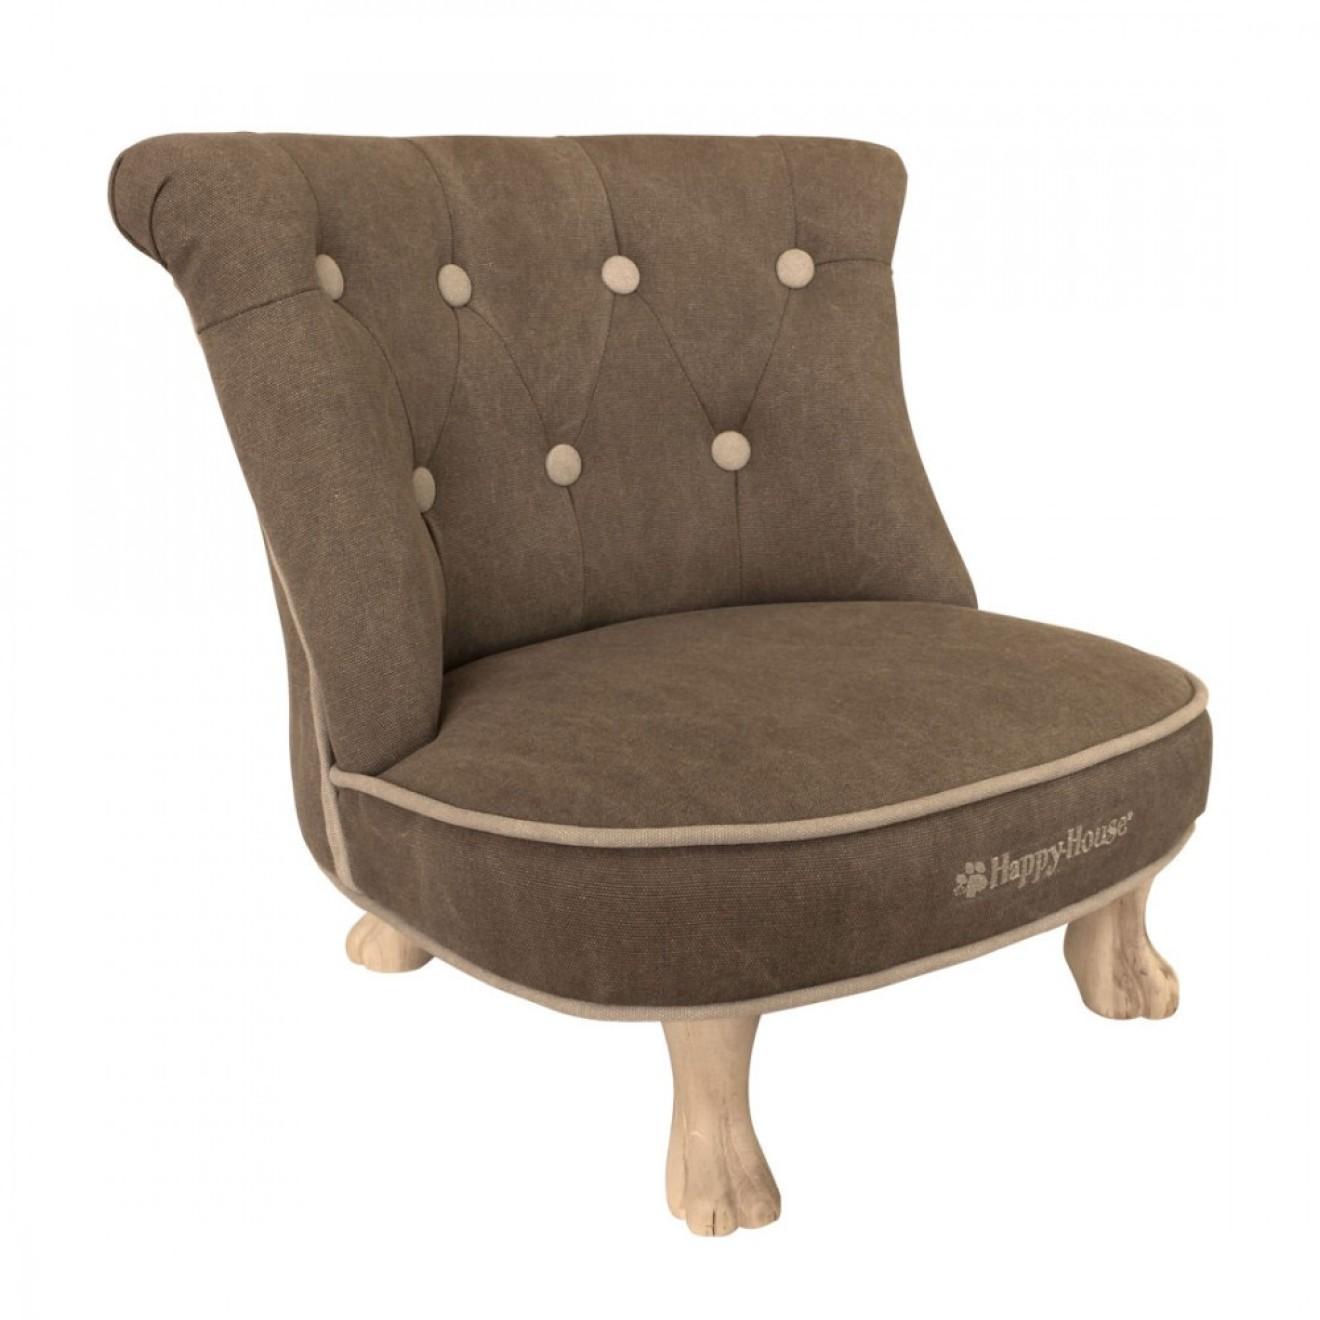 Luxus sessel  Luxus-Hundesessel taupe, Luxus-Sessel für Hunde online kaufen